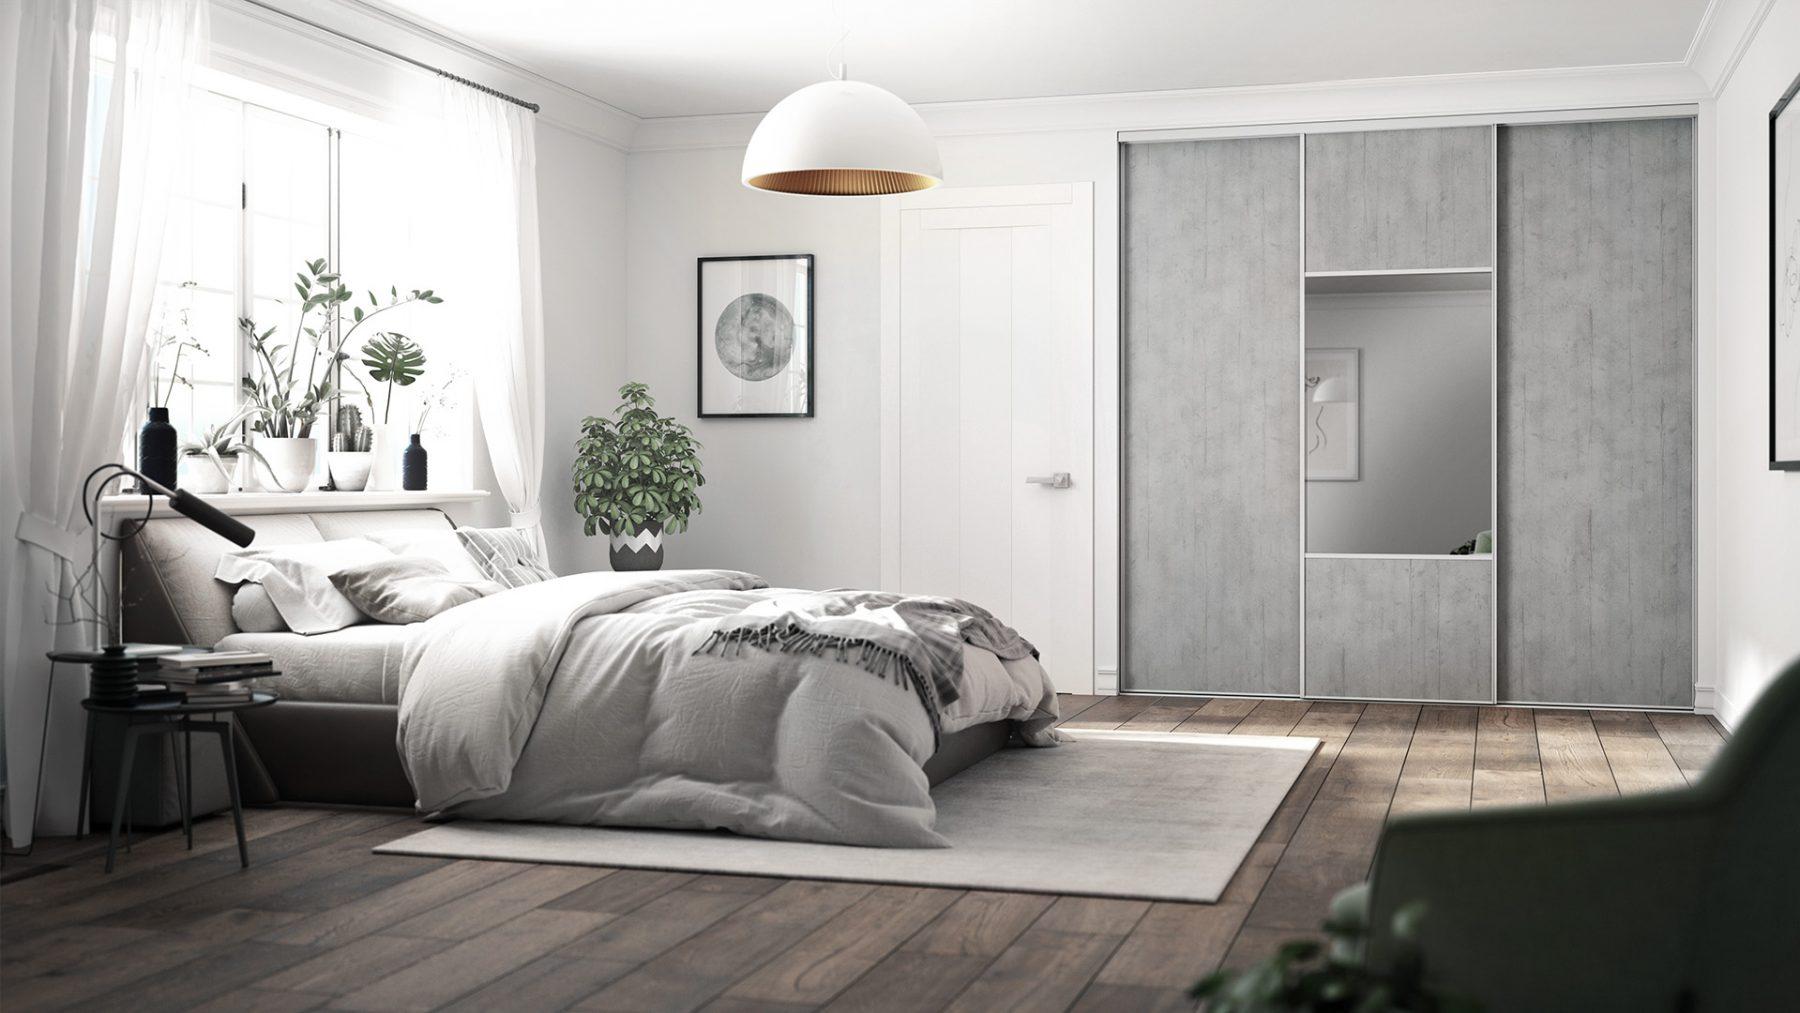 imagerie 3d illustration chambre gris lit comfortable garde robe